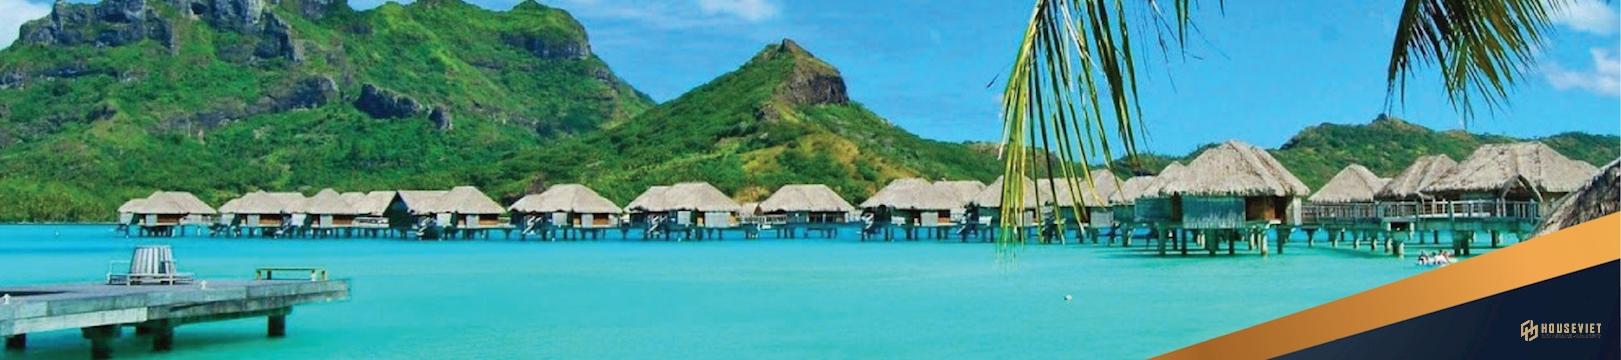 Butterfly Hometel Resort Phú Quốc